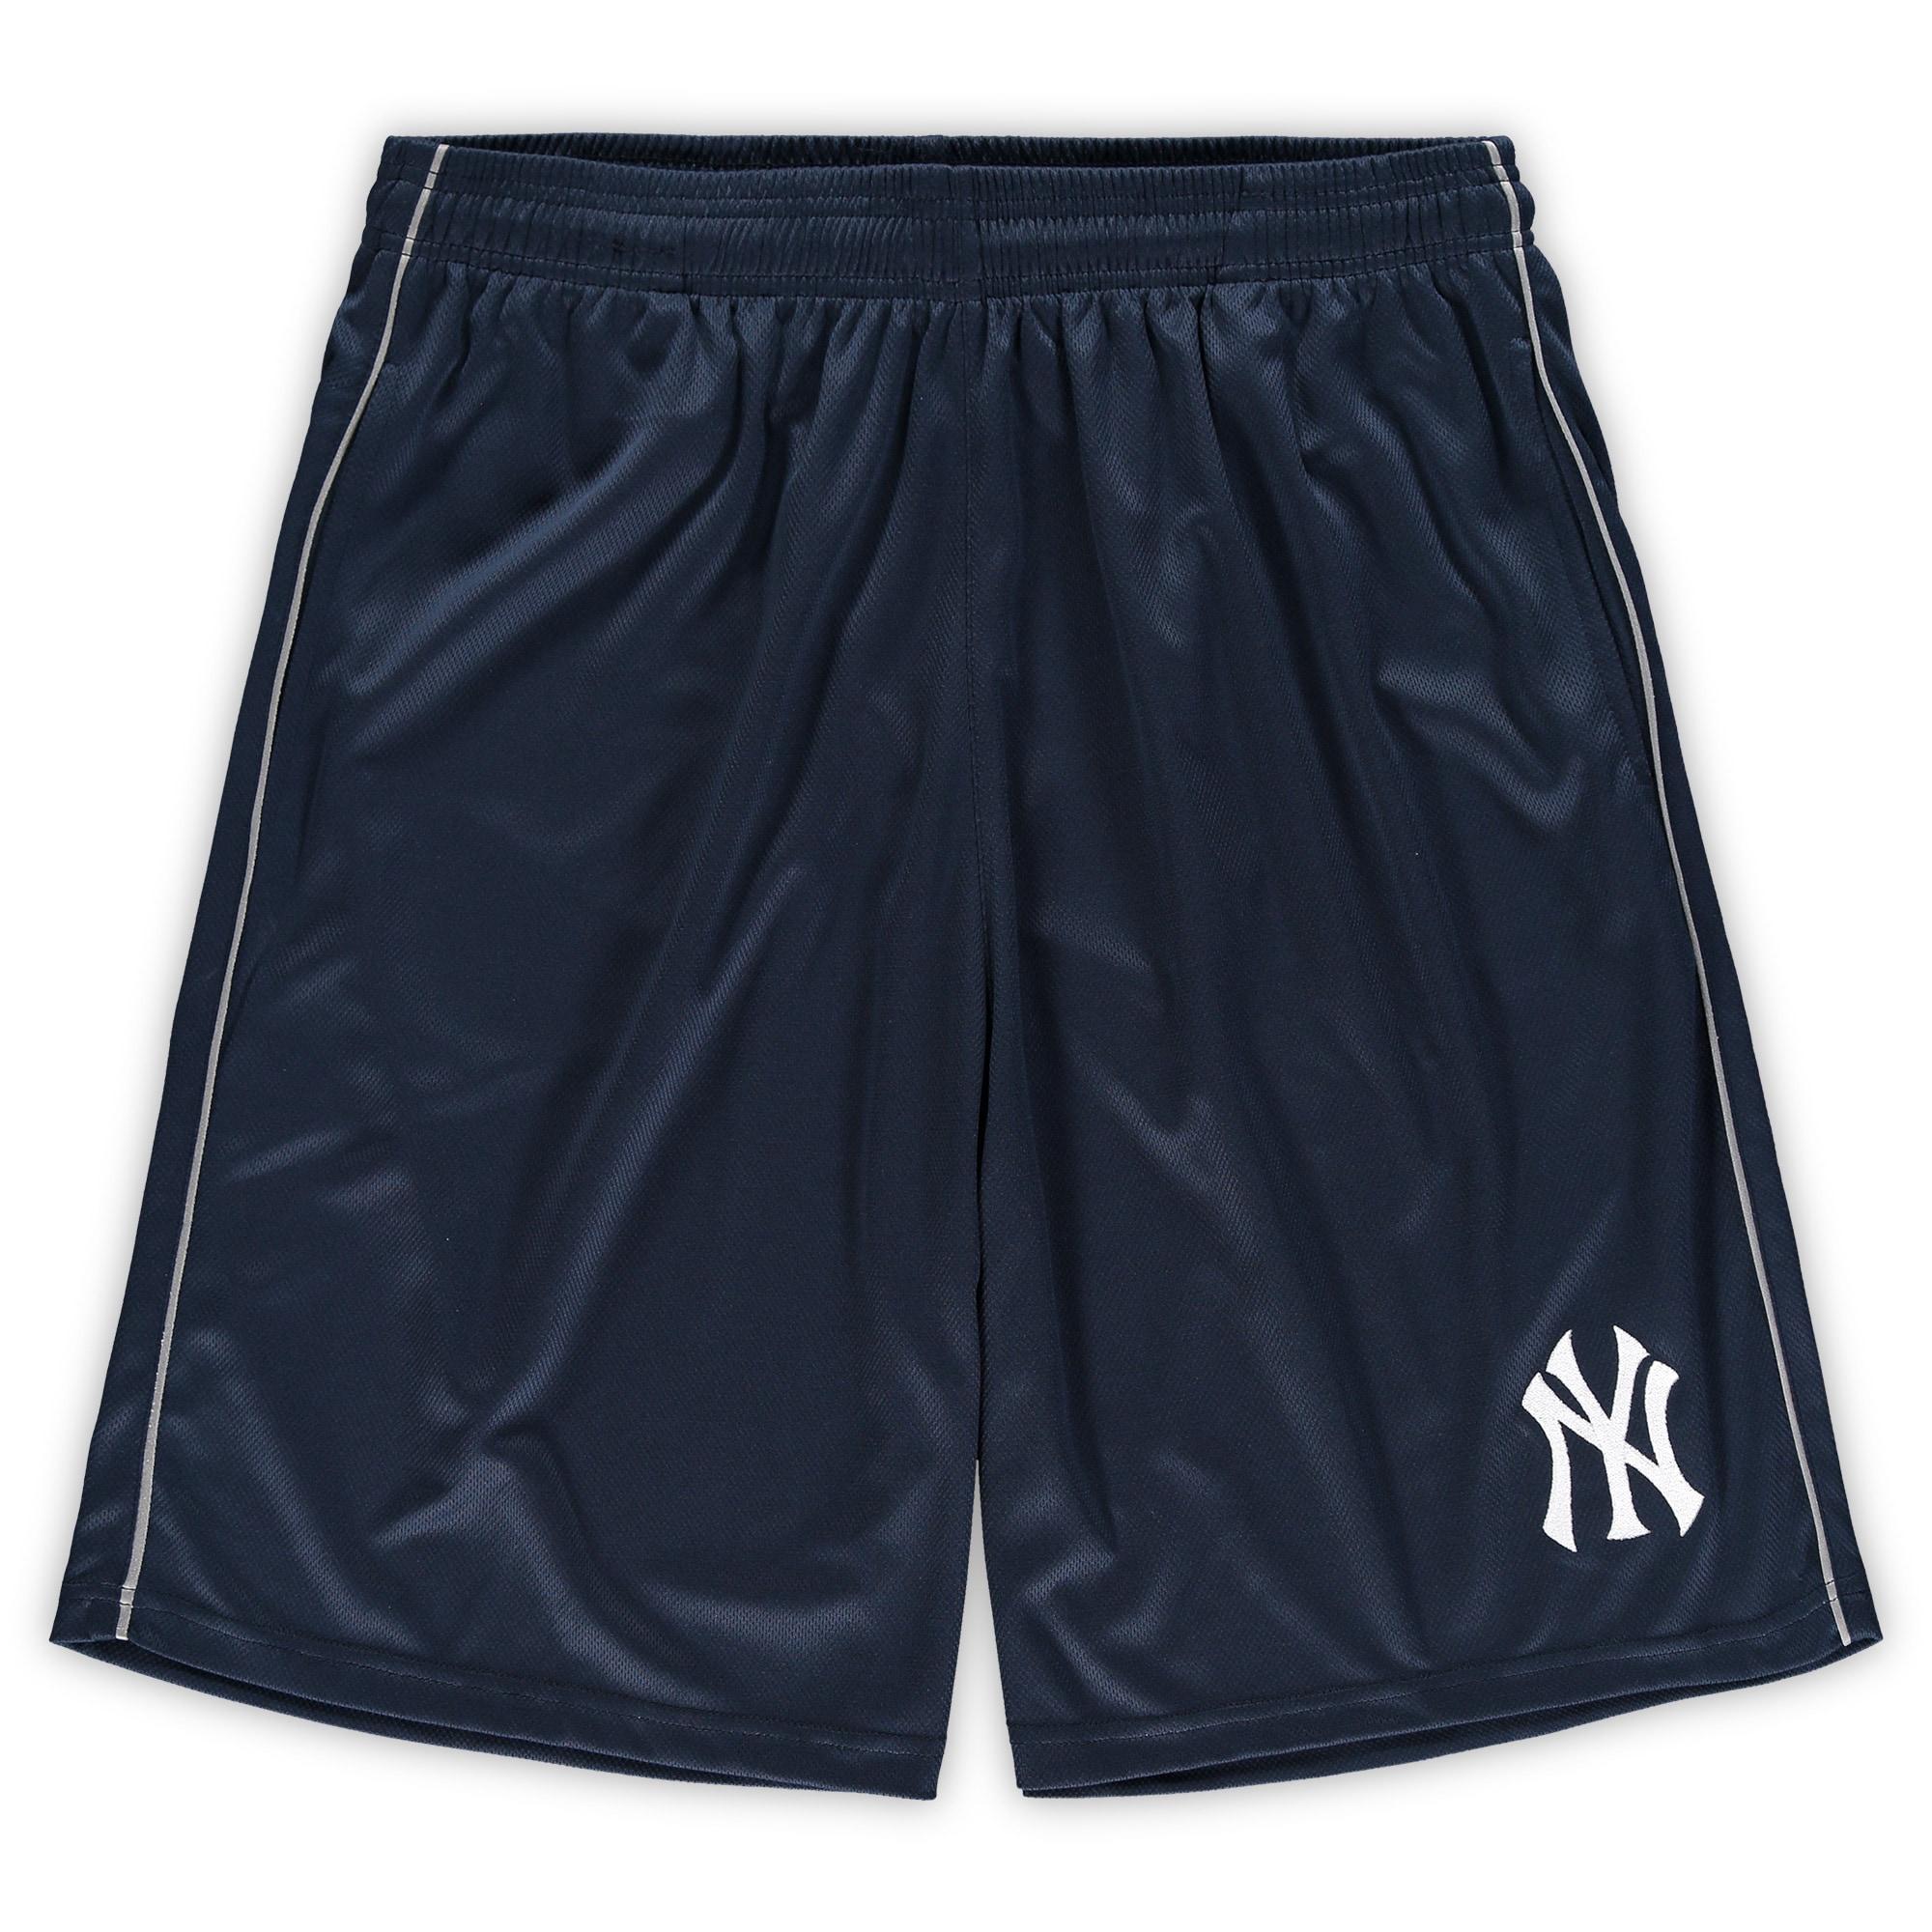 New York Yankees Majestic Big & Tall Mesh Shorts - Navy